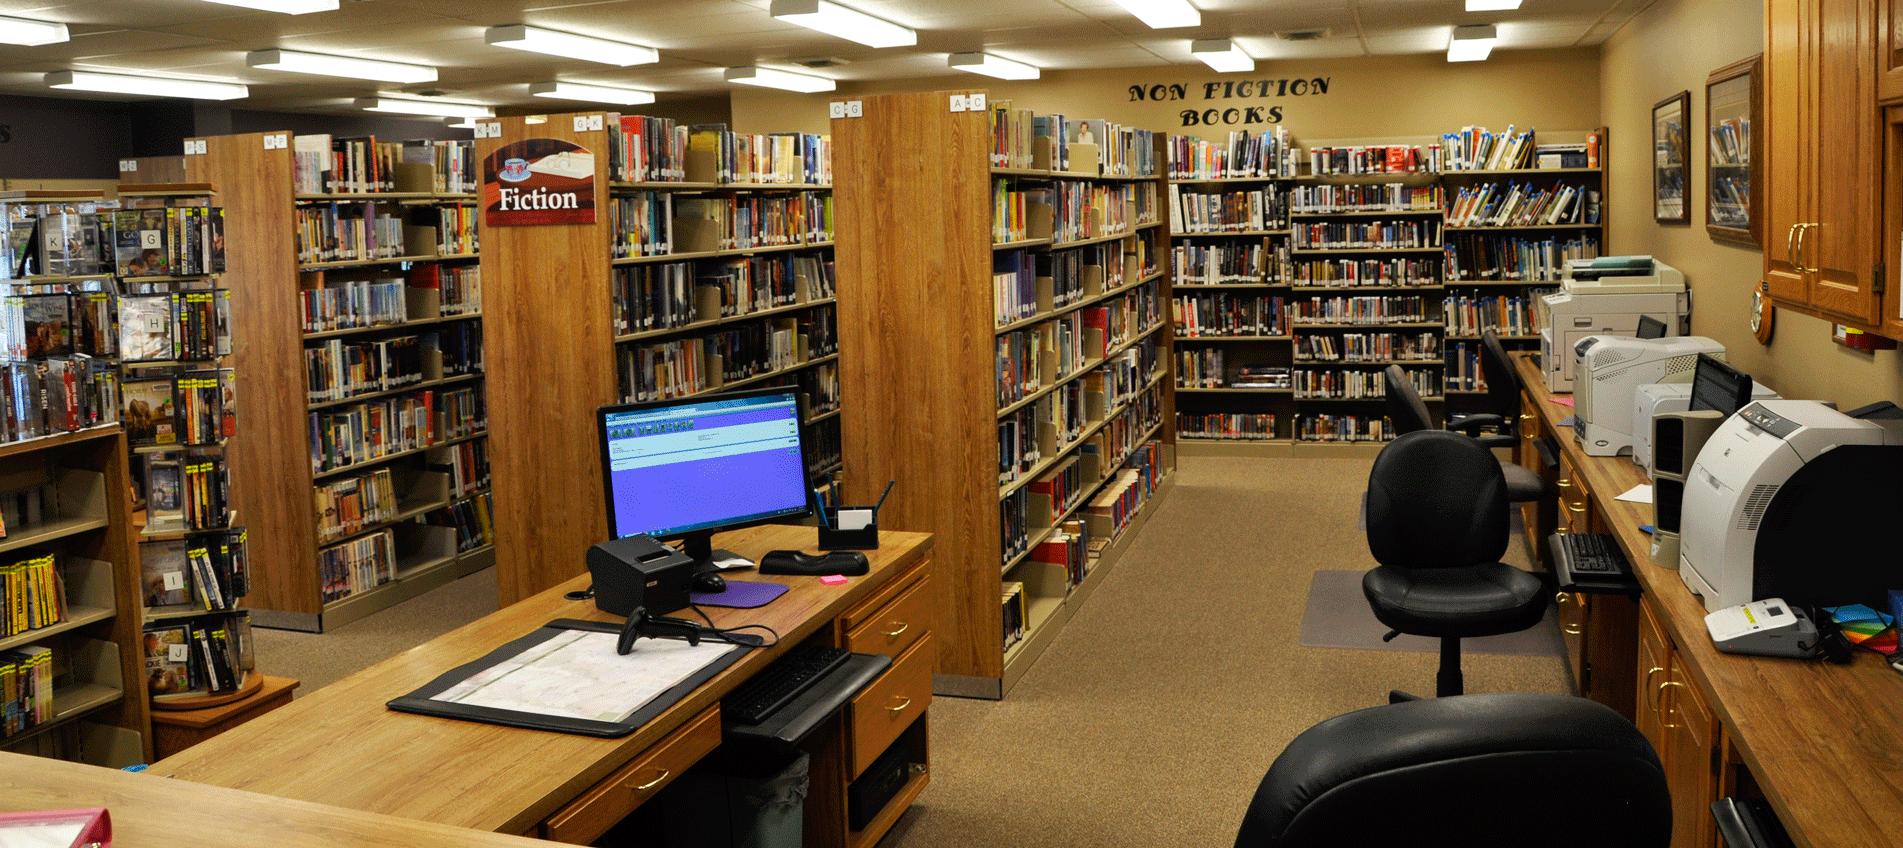 inwood public library